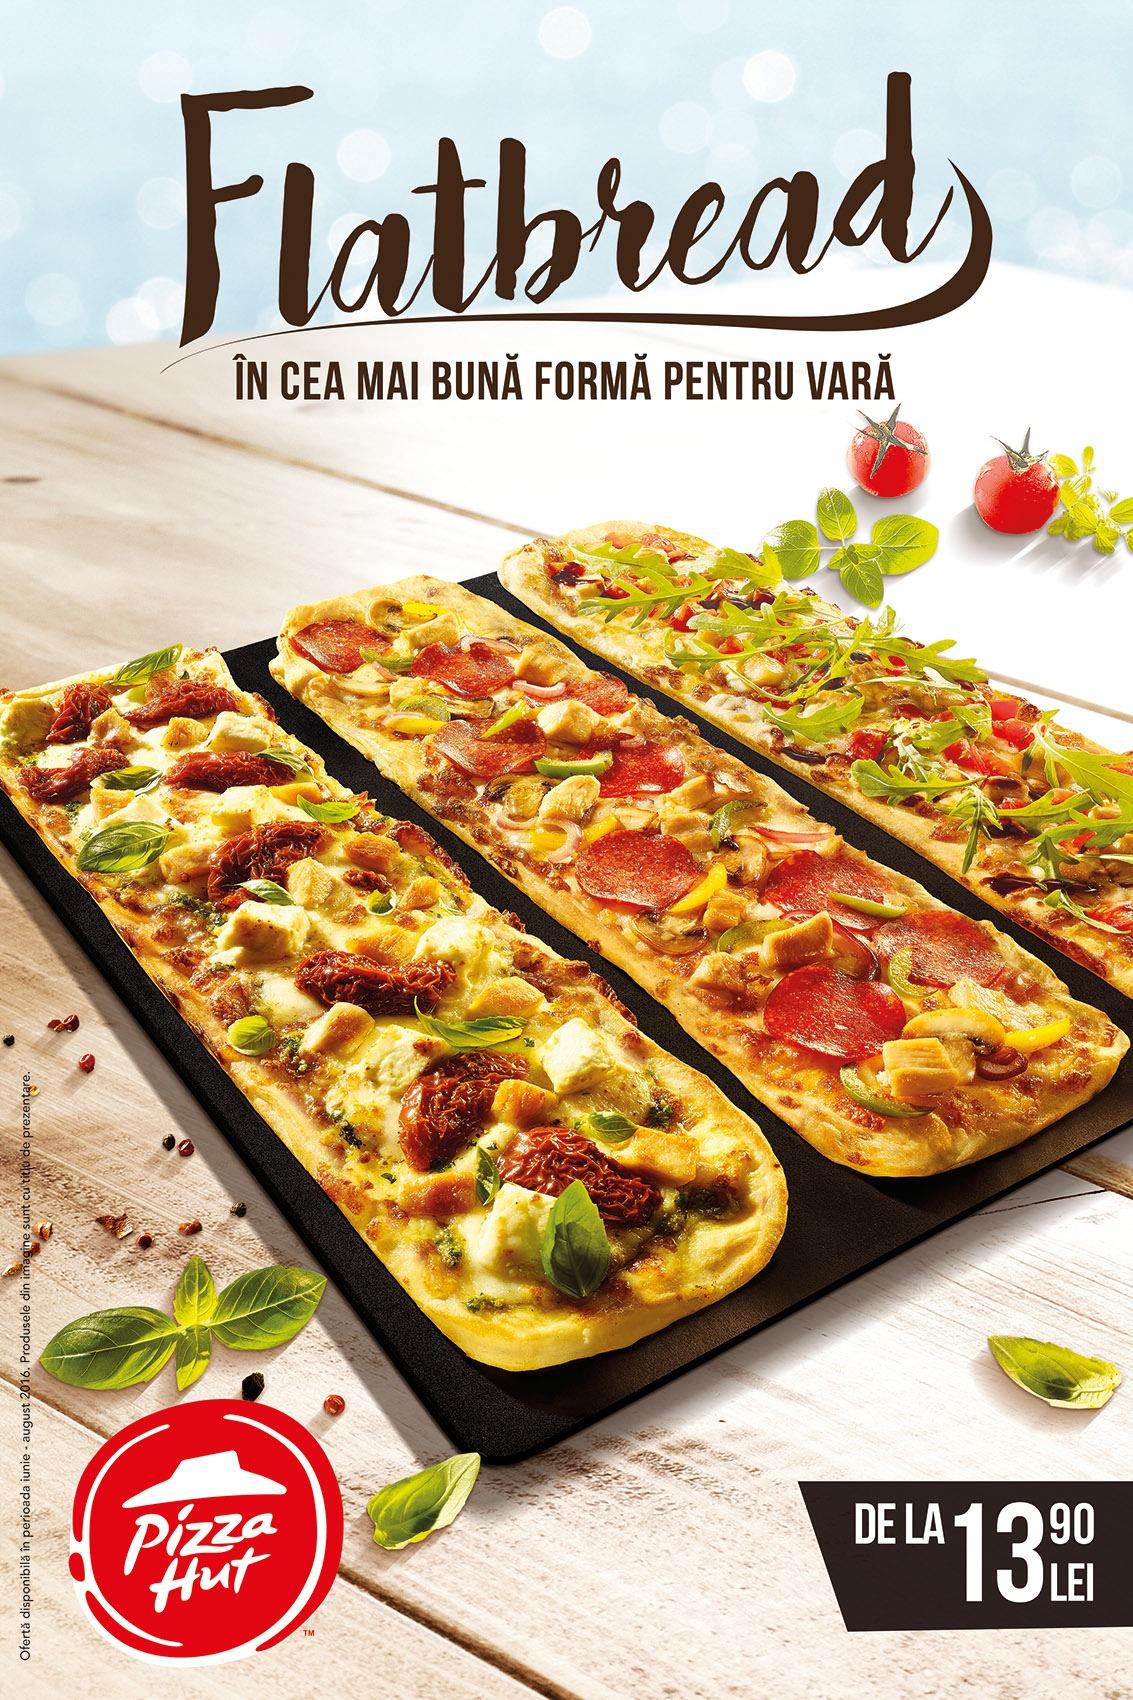 Pizza Hut Flatbread_FATA _18x27cm